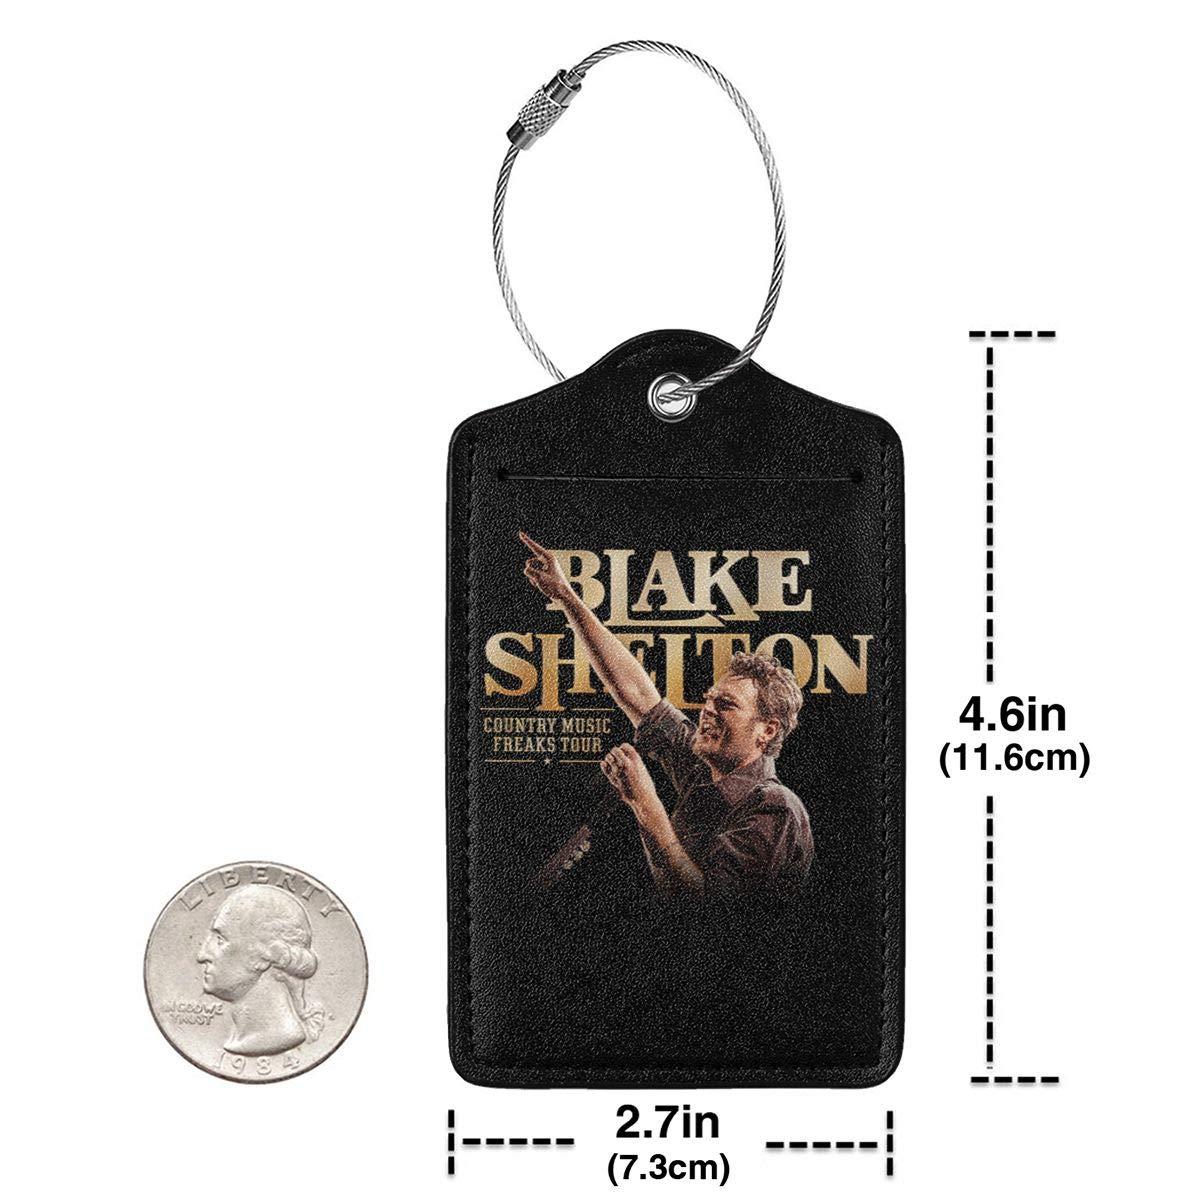 Blake Shelton Leather Luggage Tag Travel ID Label For Baggage Suitcase